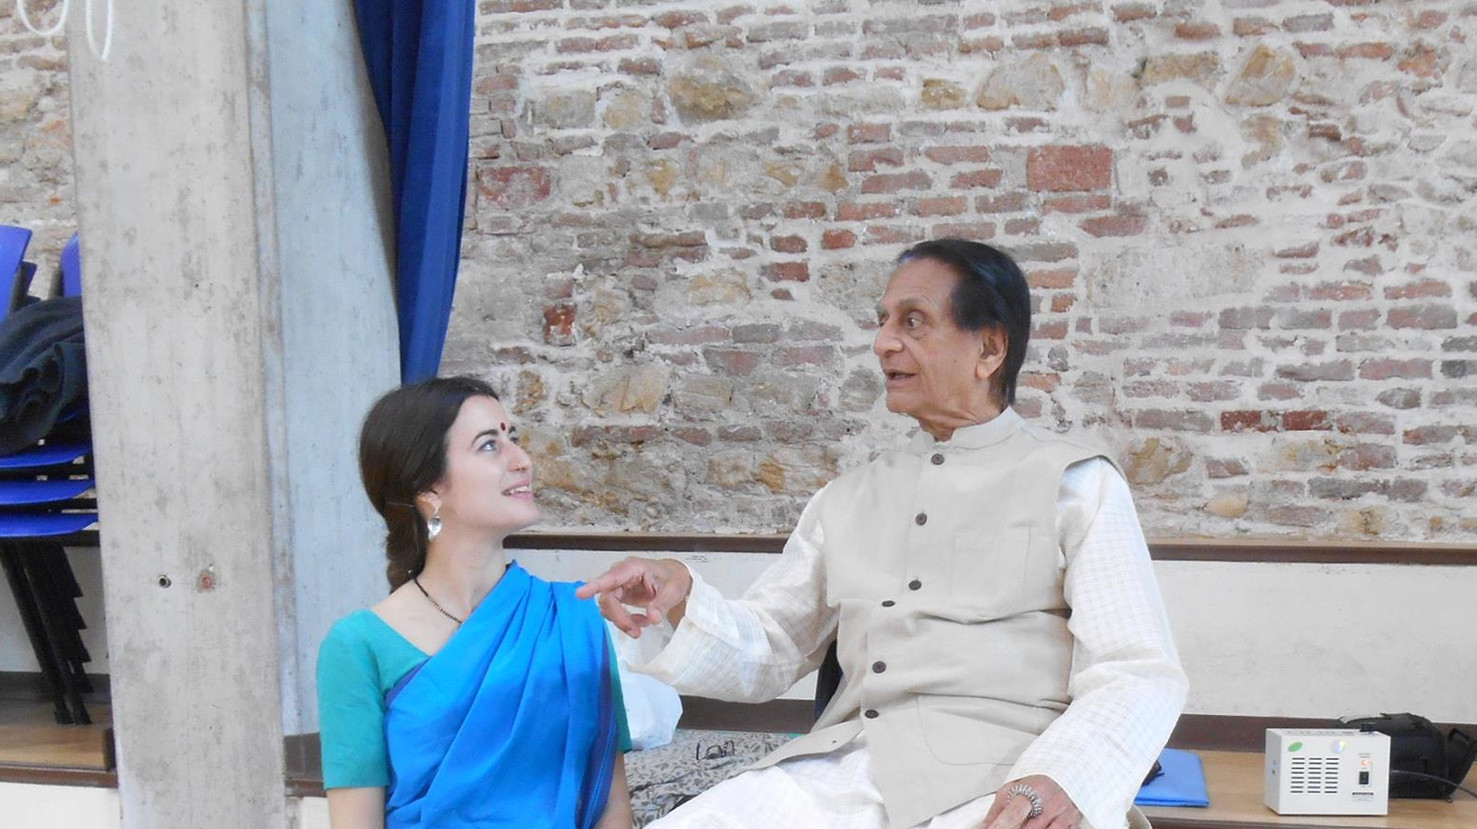 With Prof. CV Chandrashekar